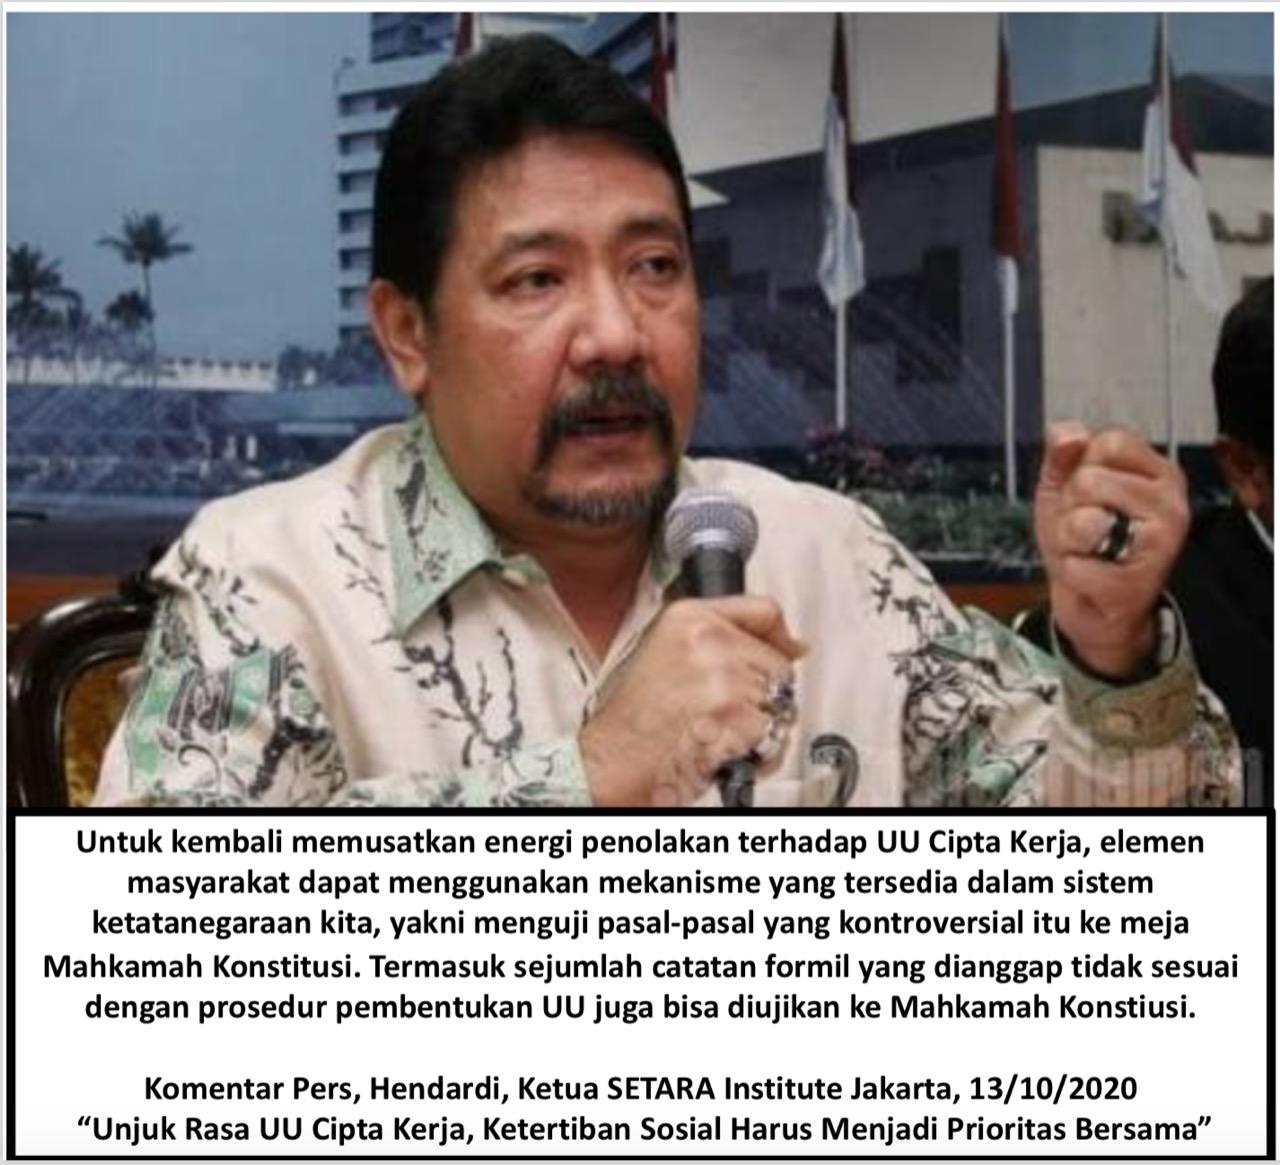 Hendardi selaku ketua SETARA Institute menyampaikan komentar pers Dalam Aksi Unjuk Rasa UU Cipta Kerja